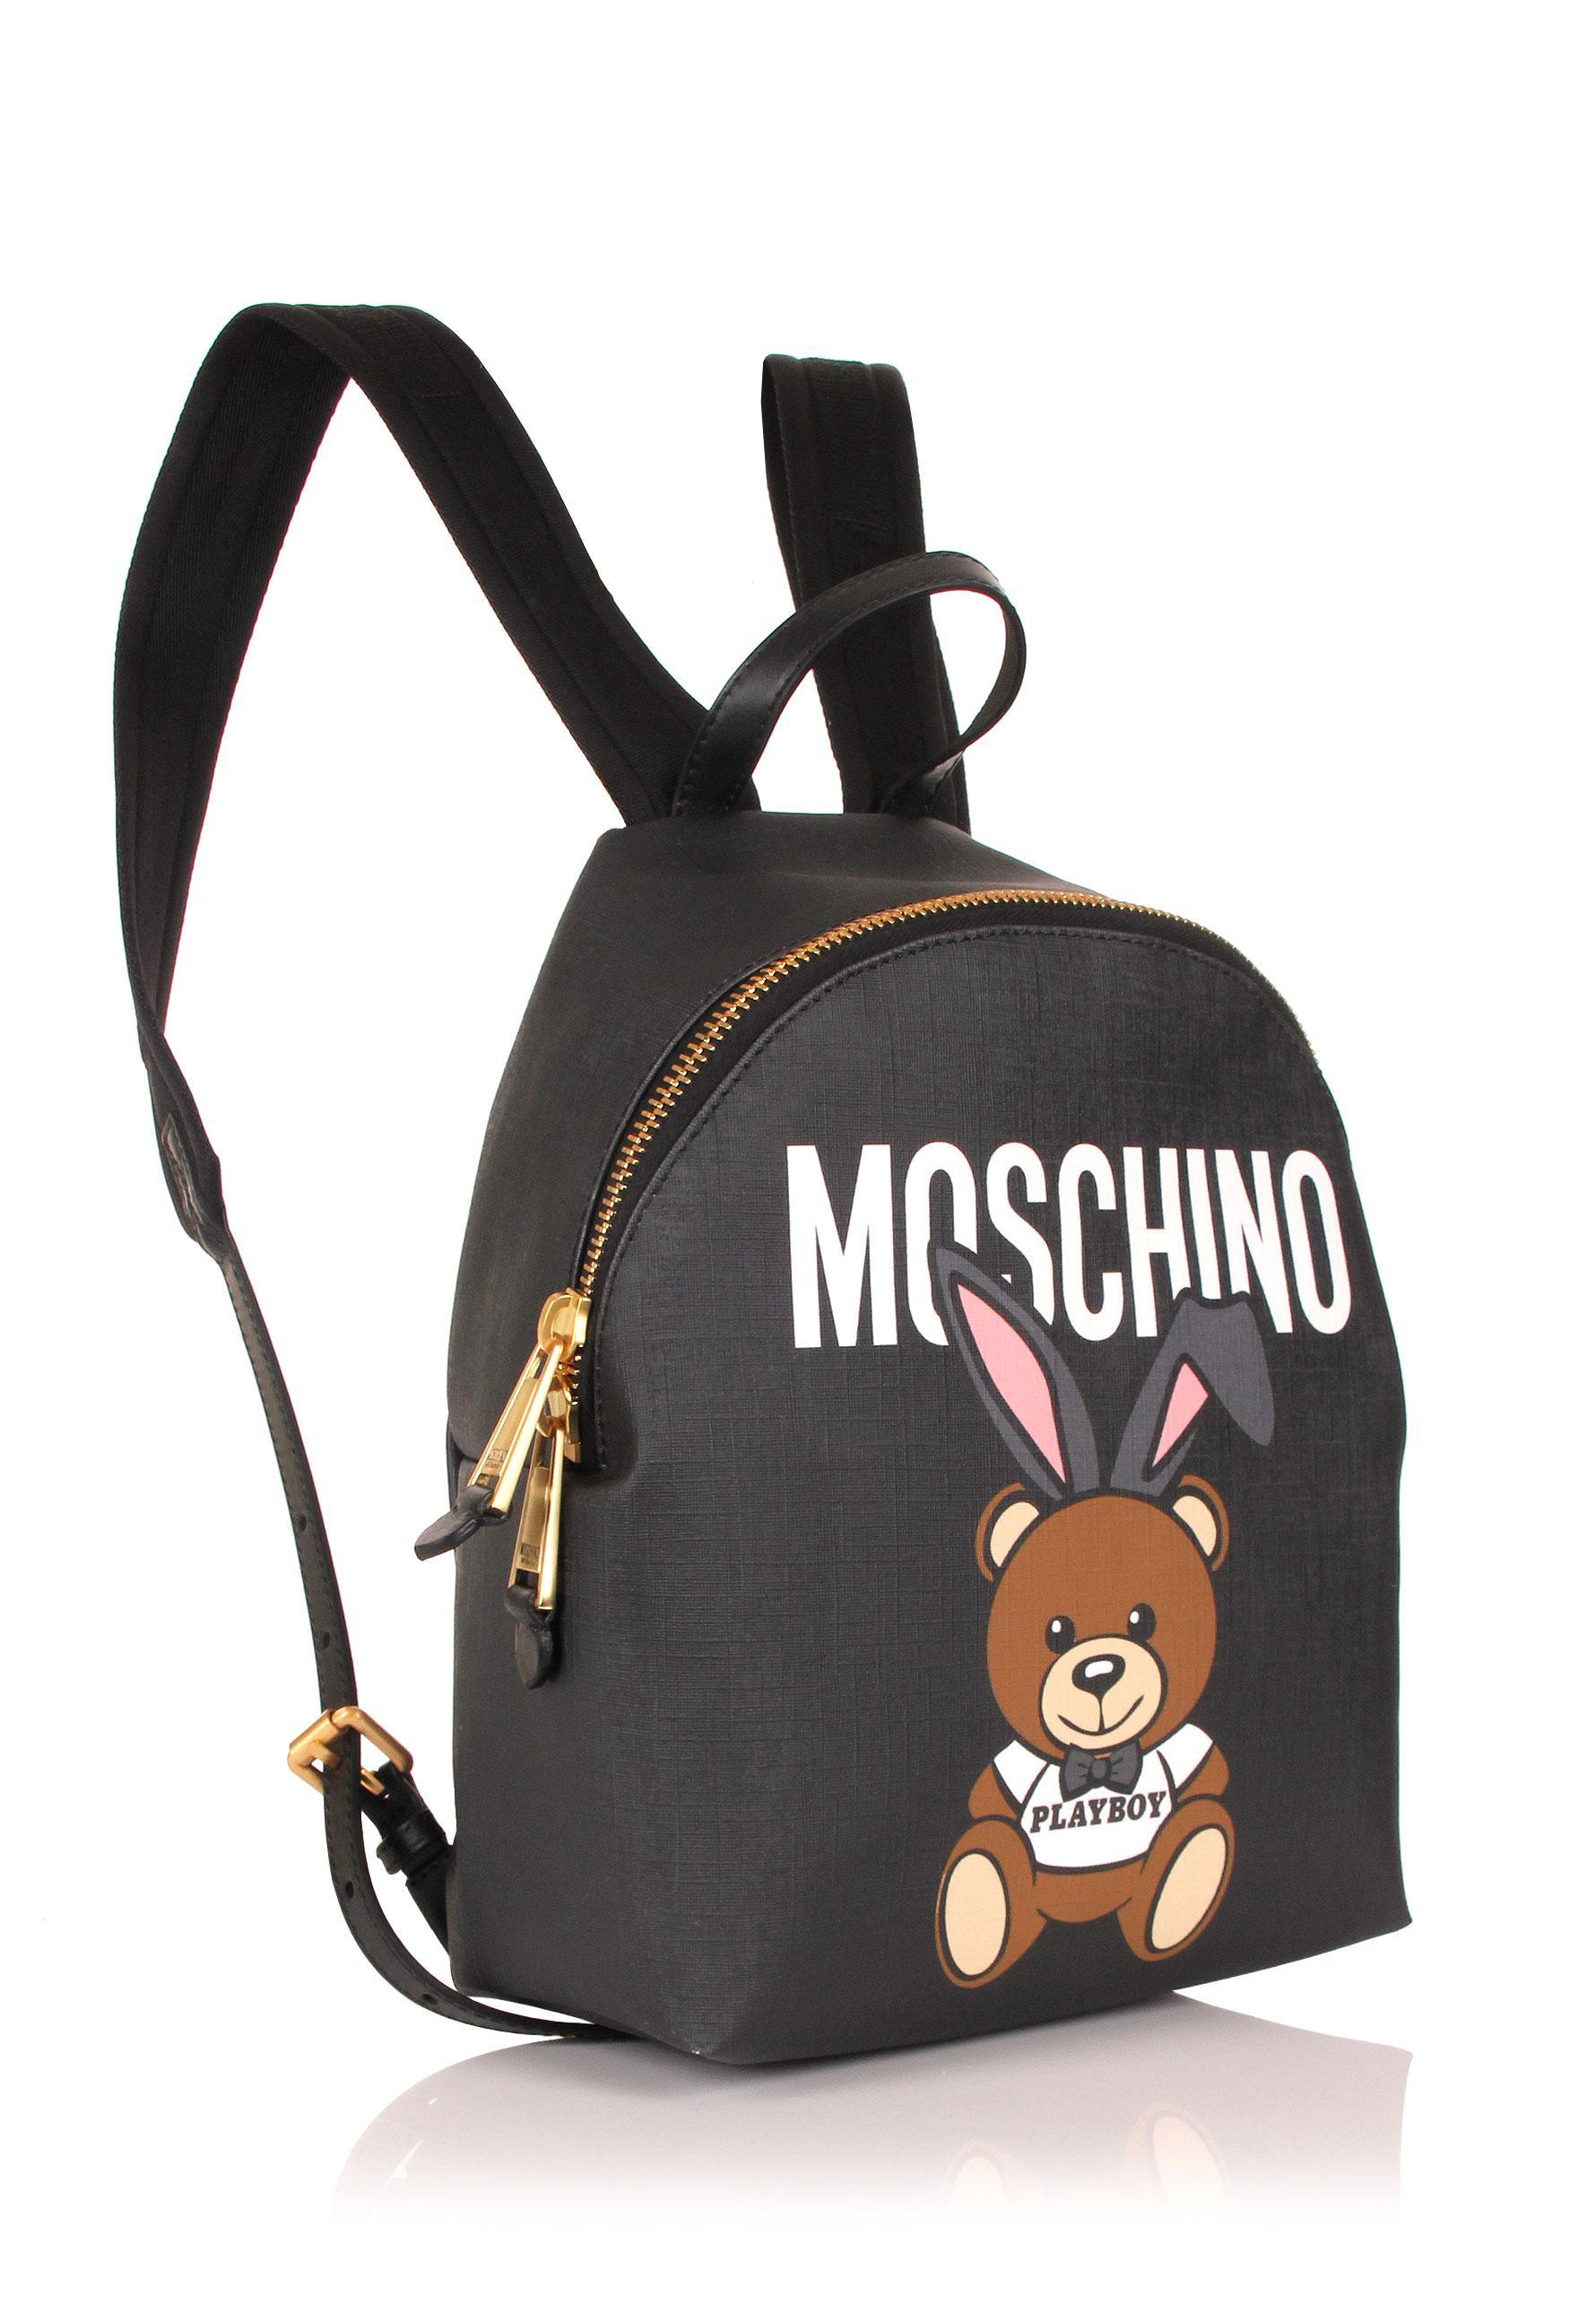 Moschino teddy playboy mini backpack BHJPAj0